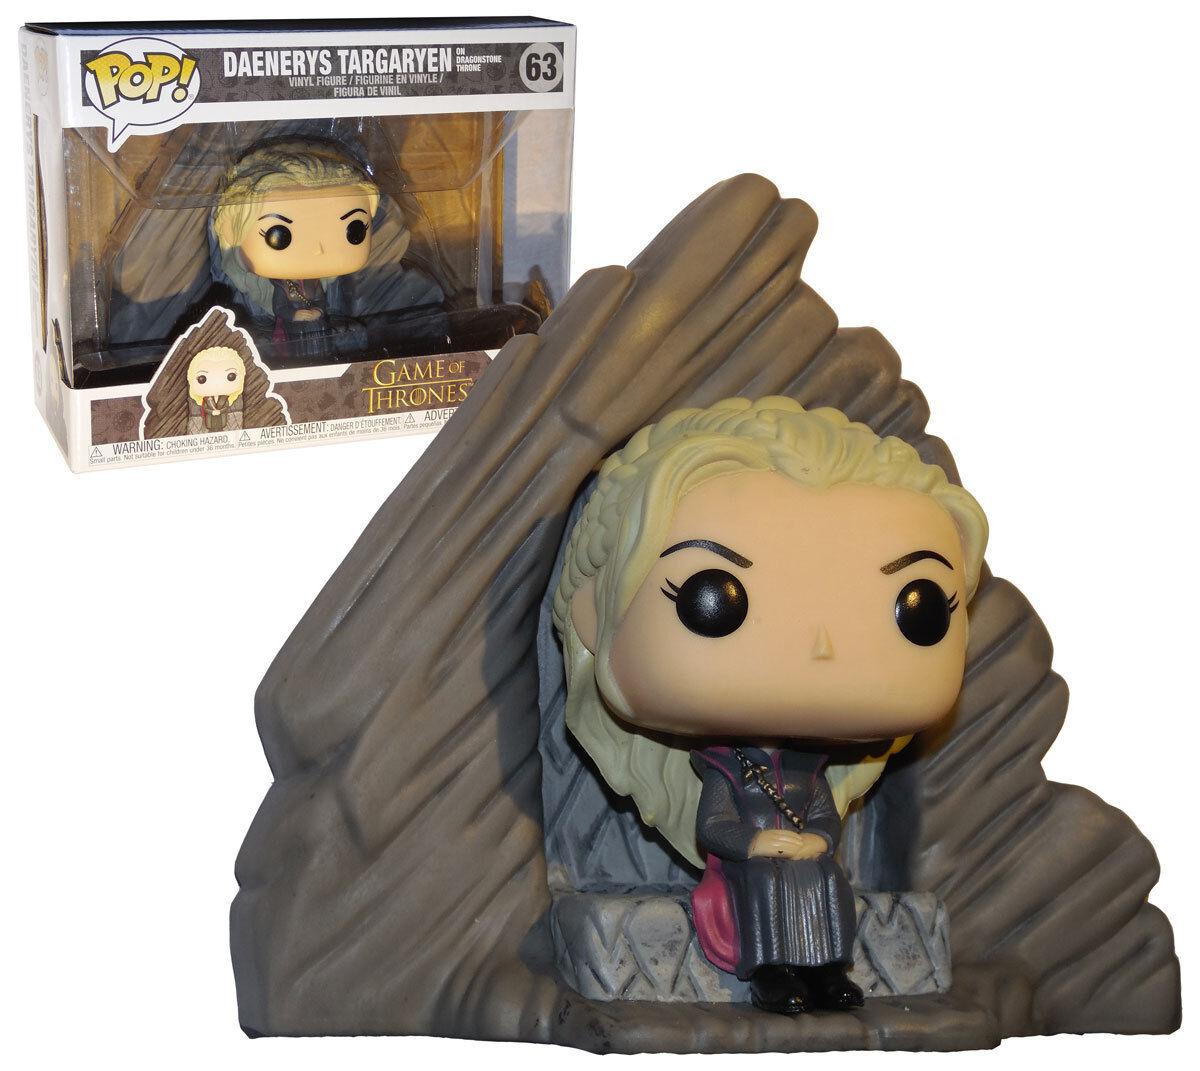 Game of Thrones Daenerys Daenerys Daenerys Targaryen On Dragonstone Throne Pop  Funko Vinyl Figure 07f071